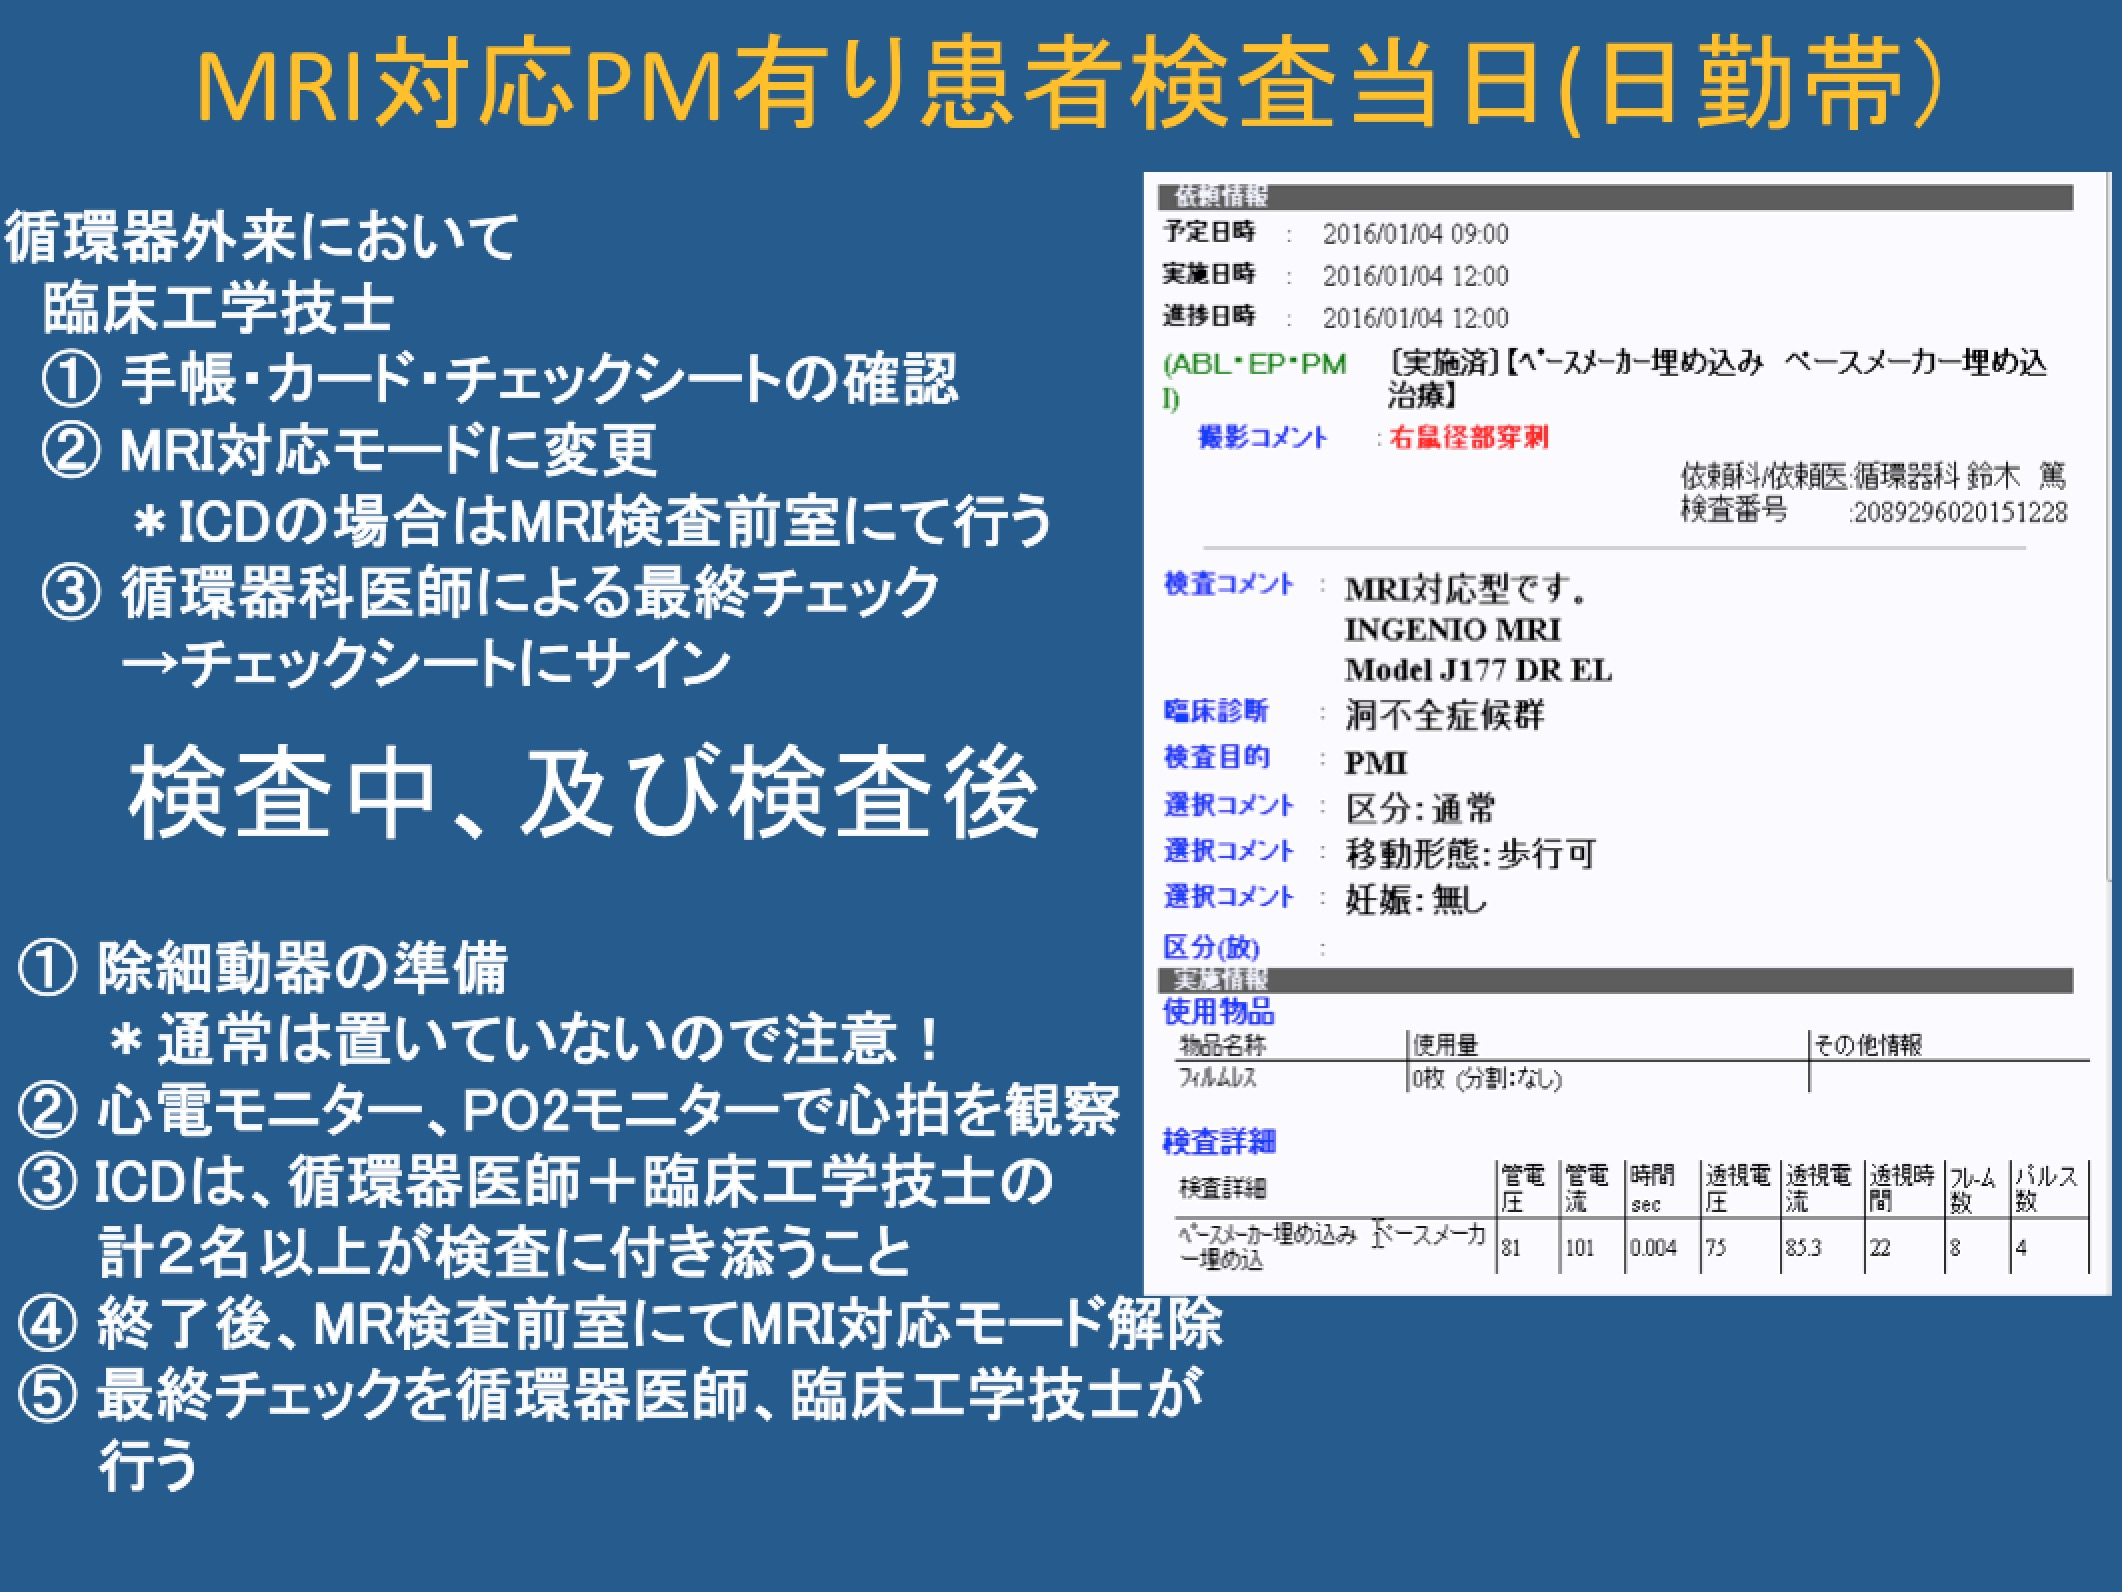 SC 2016-03-10 13.14.06